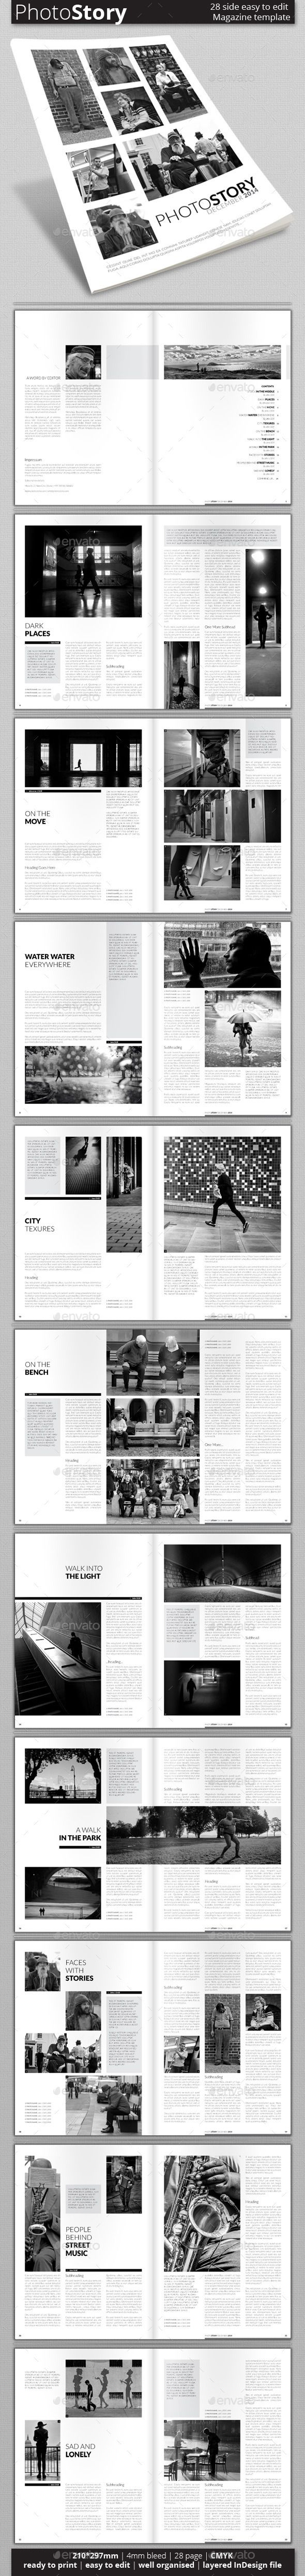 Multipurpose Magazine Template #magazinetemplate Download: http://graphicriver.net/item/multipurpose-magazine-template-vol-3/9439506?ref=ksioks